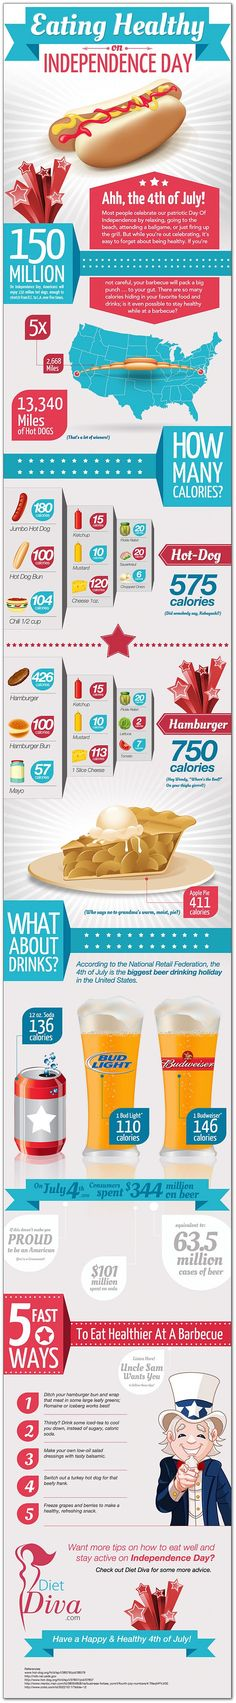 Infographic - BestLifes Thanksgiving Roa  - http://myfitmotiv.com - #myfitmotiv #fitness motivation #weight #loss #food #fitness #diet #gym #motivation www.greennutrilabs.com